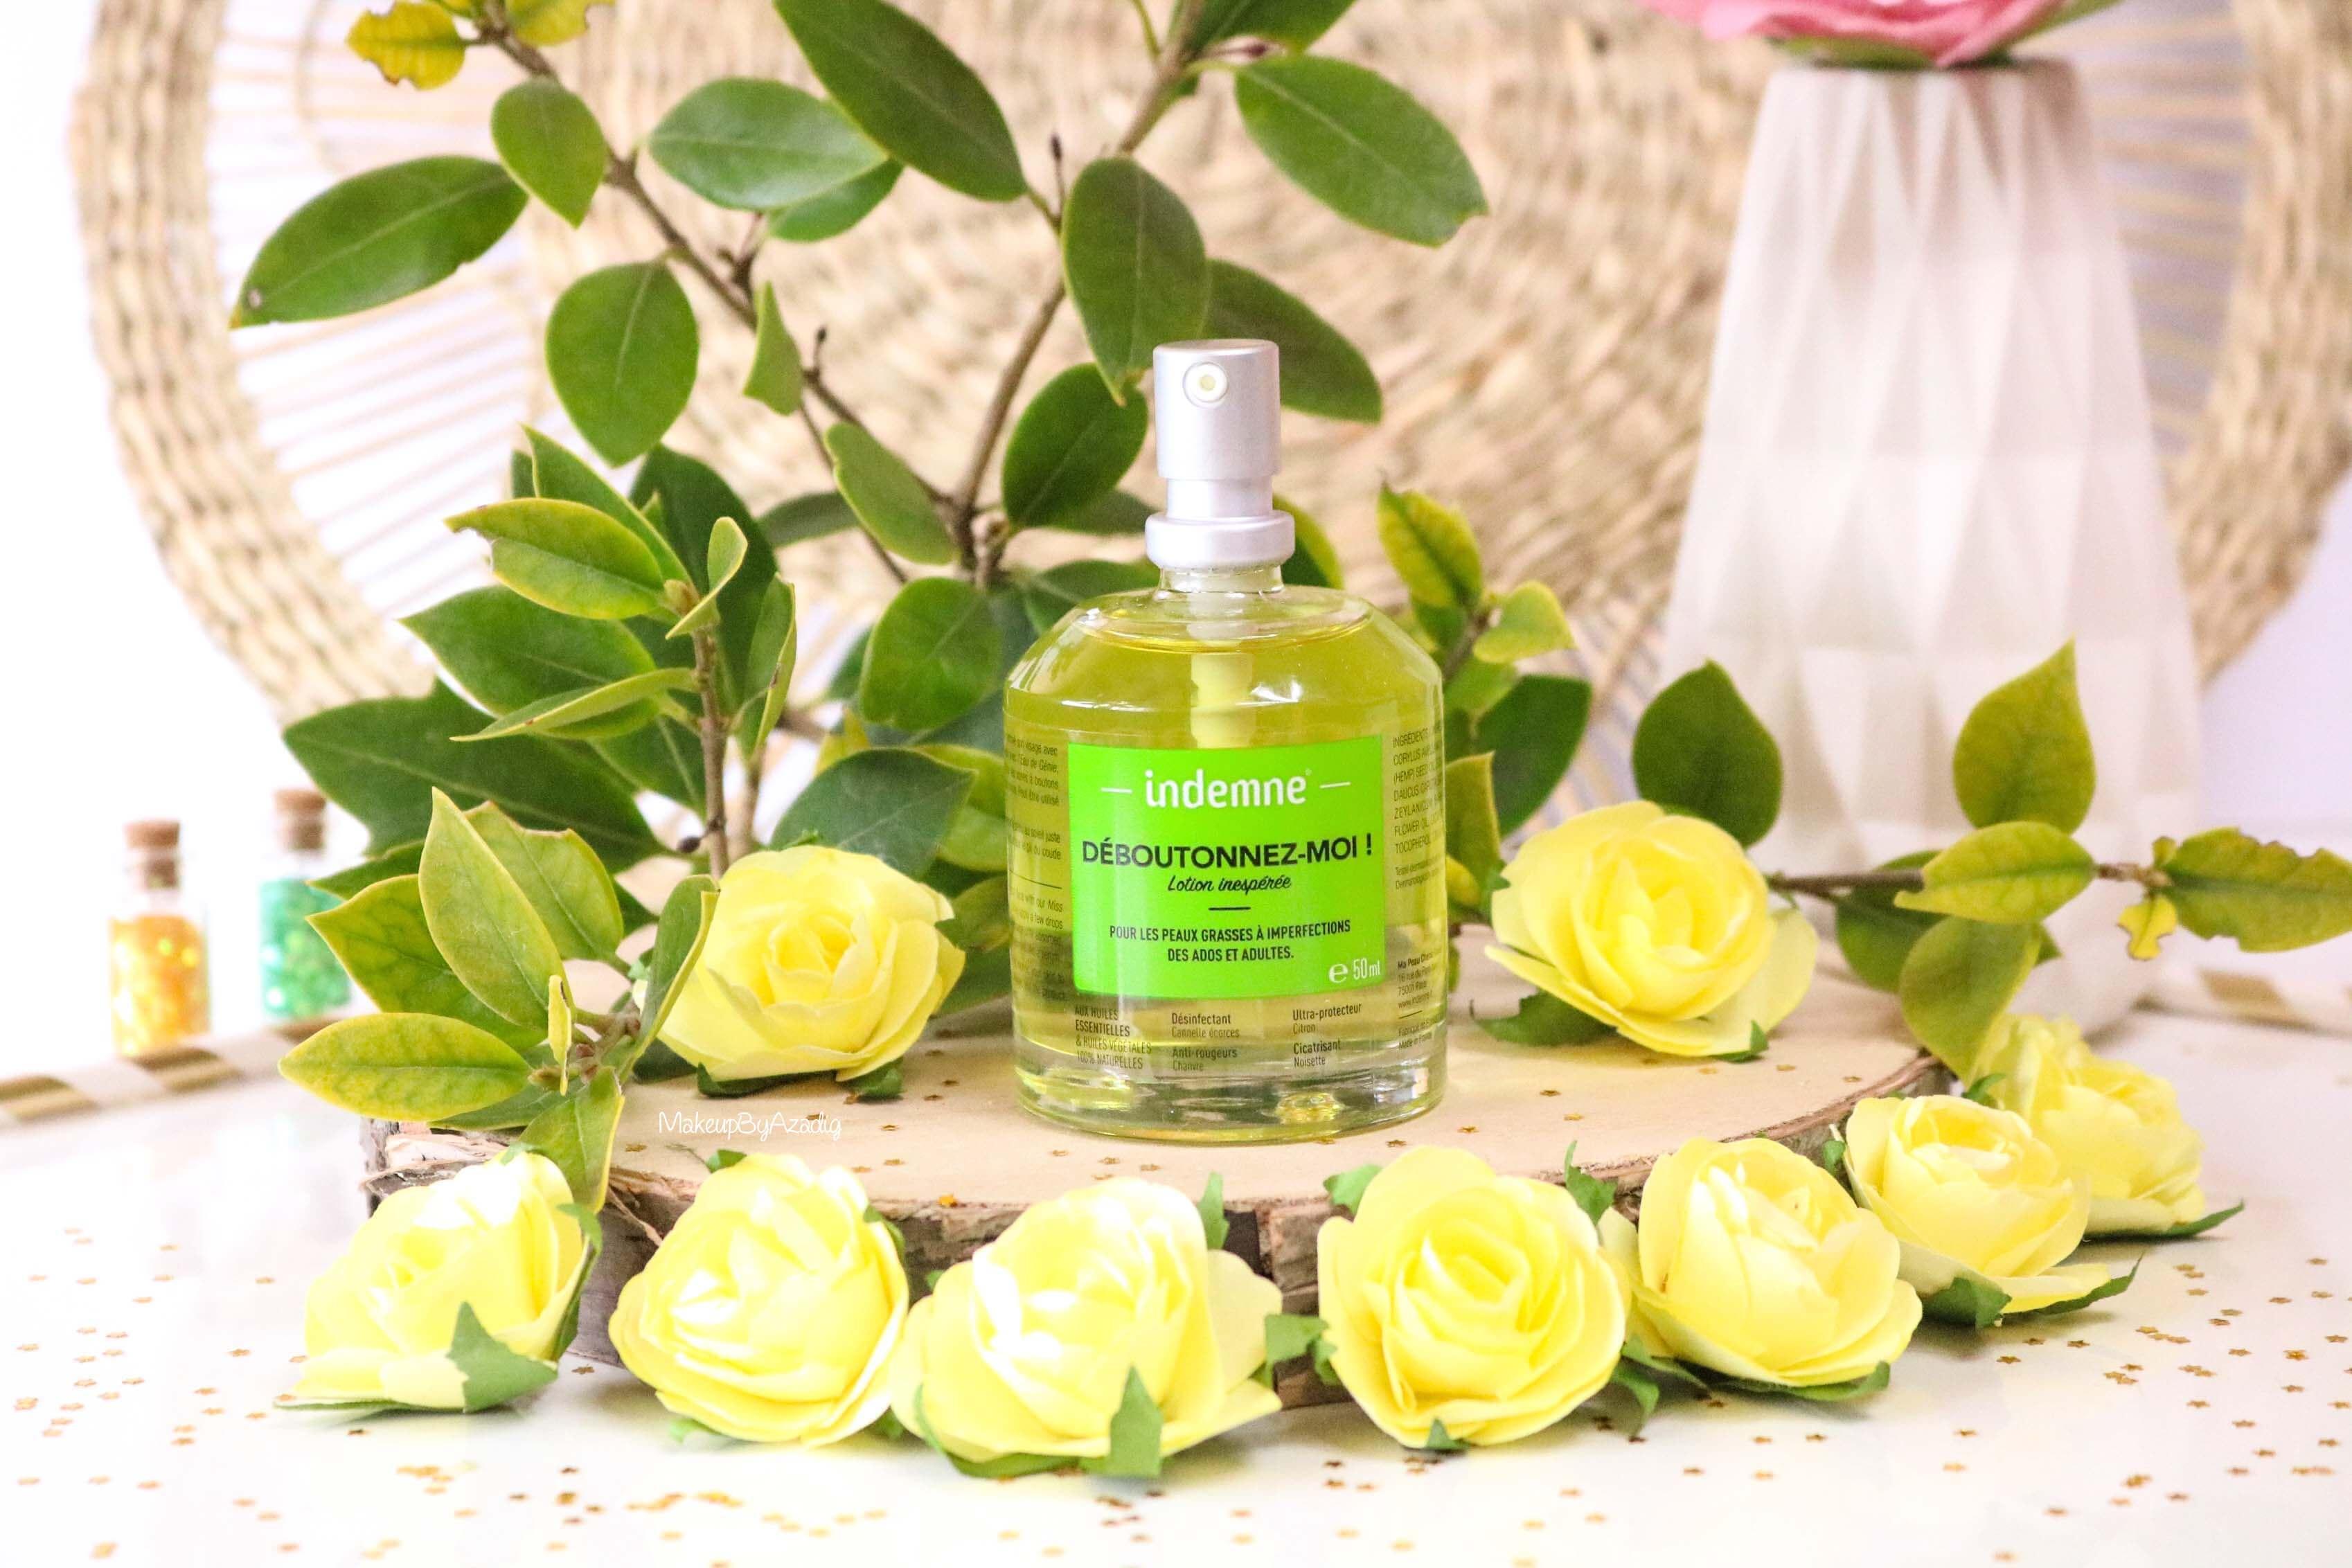 revue-deboutonnez-moi-indemne-produit-acnee-bio-huiles-parapharmacie-prix-avis-makeupbyazadig-lotion